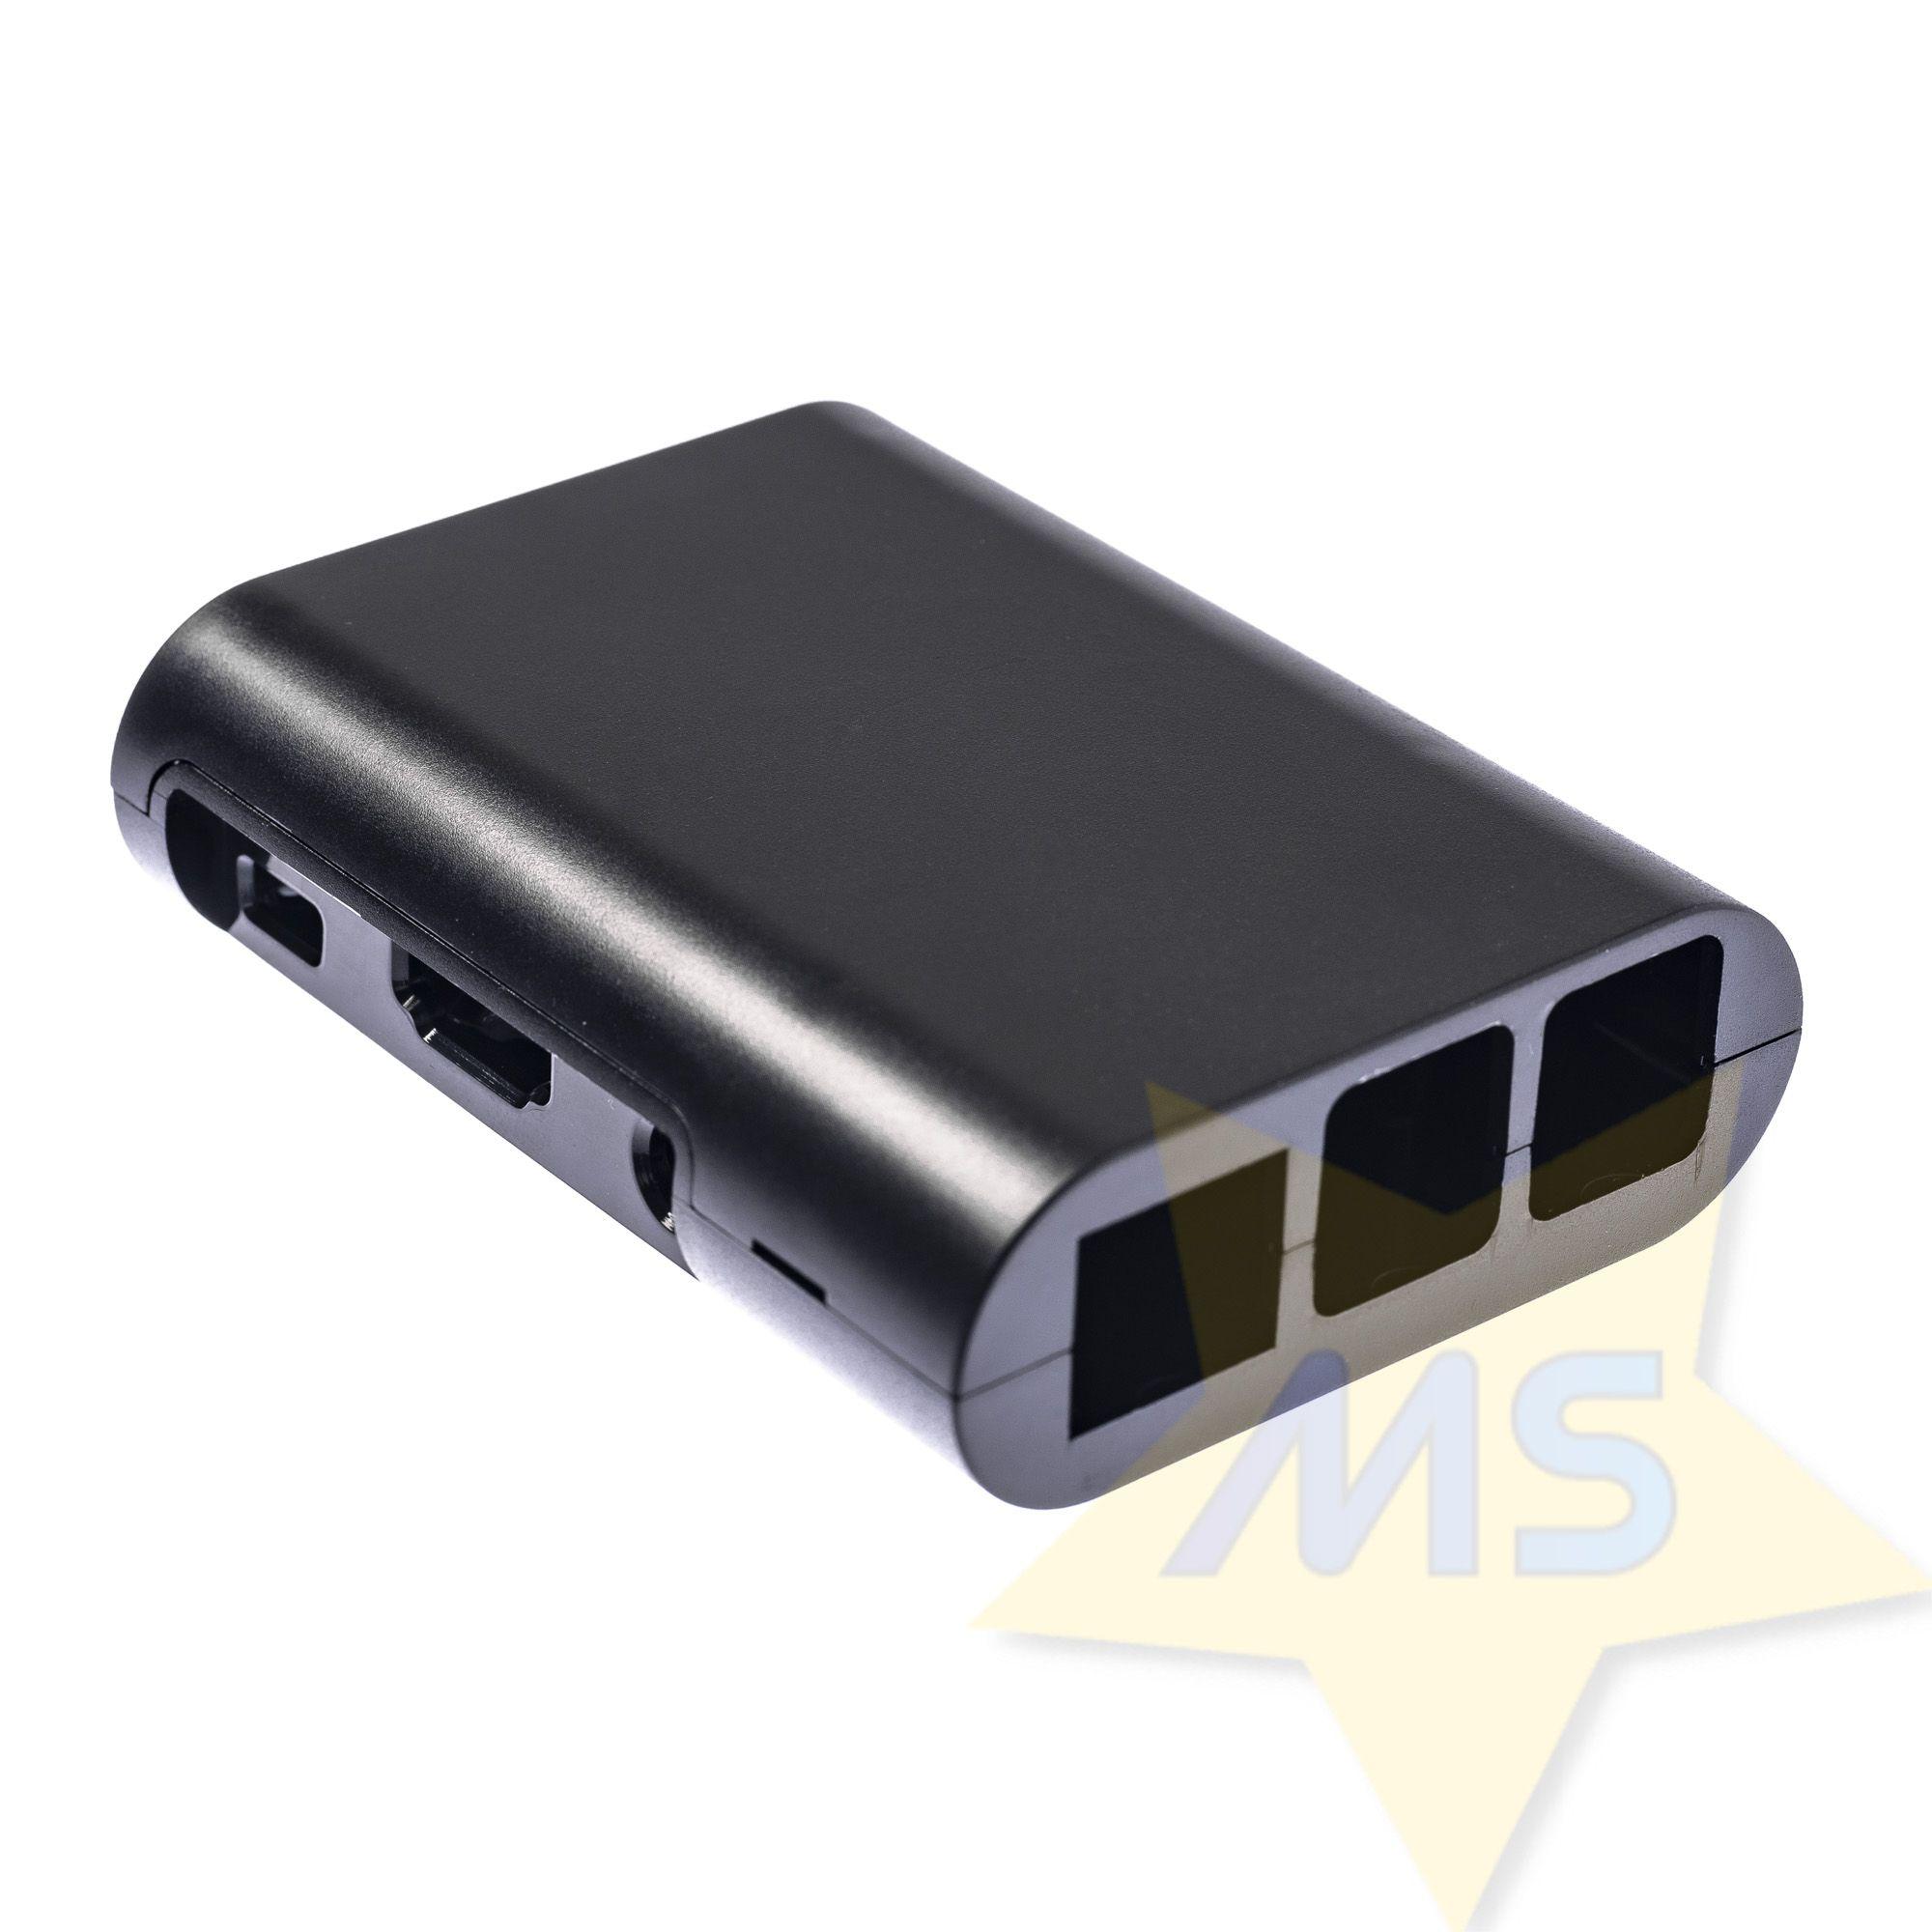 Case Raspberry Pi 2 3 B+ Preto ABS